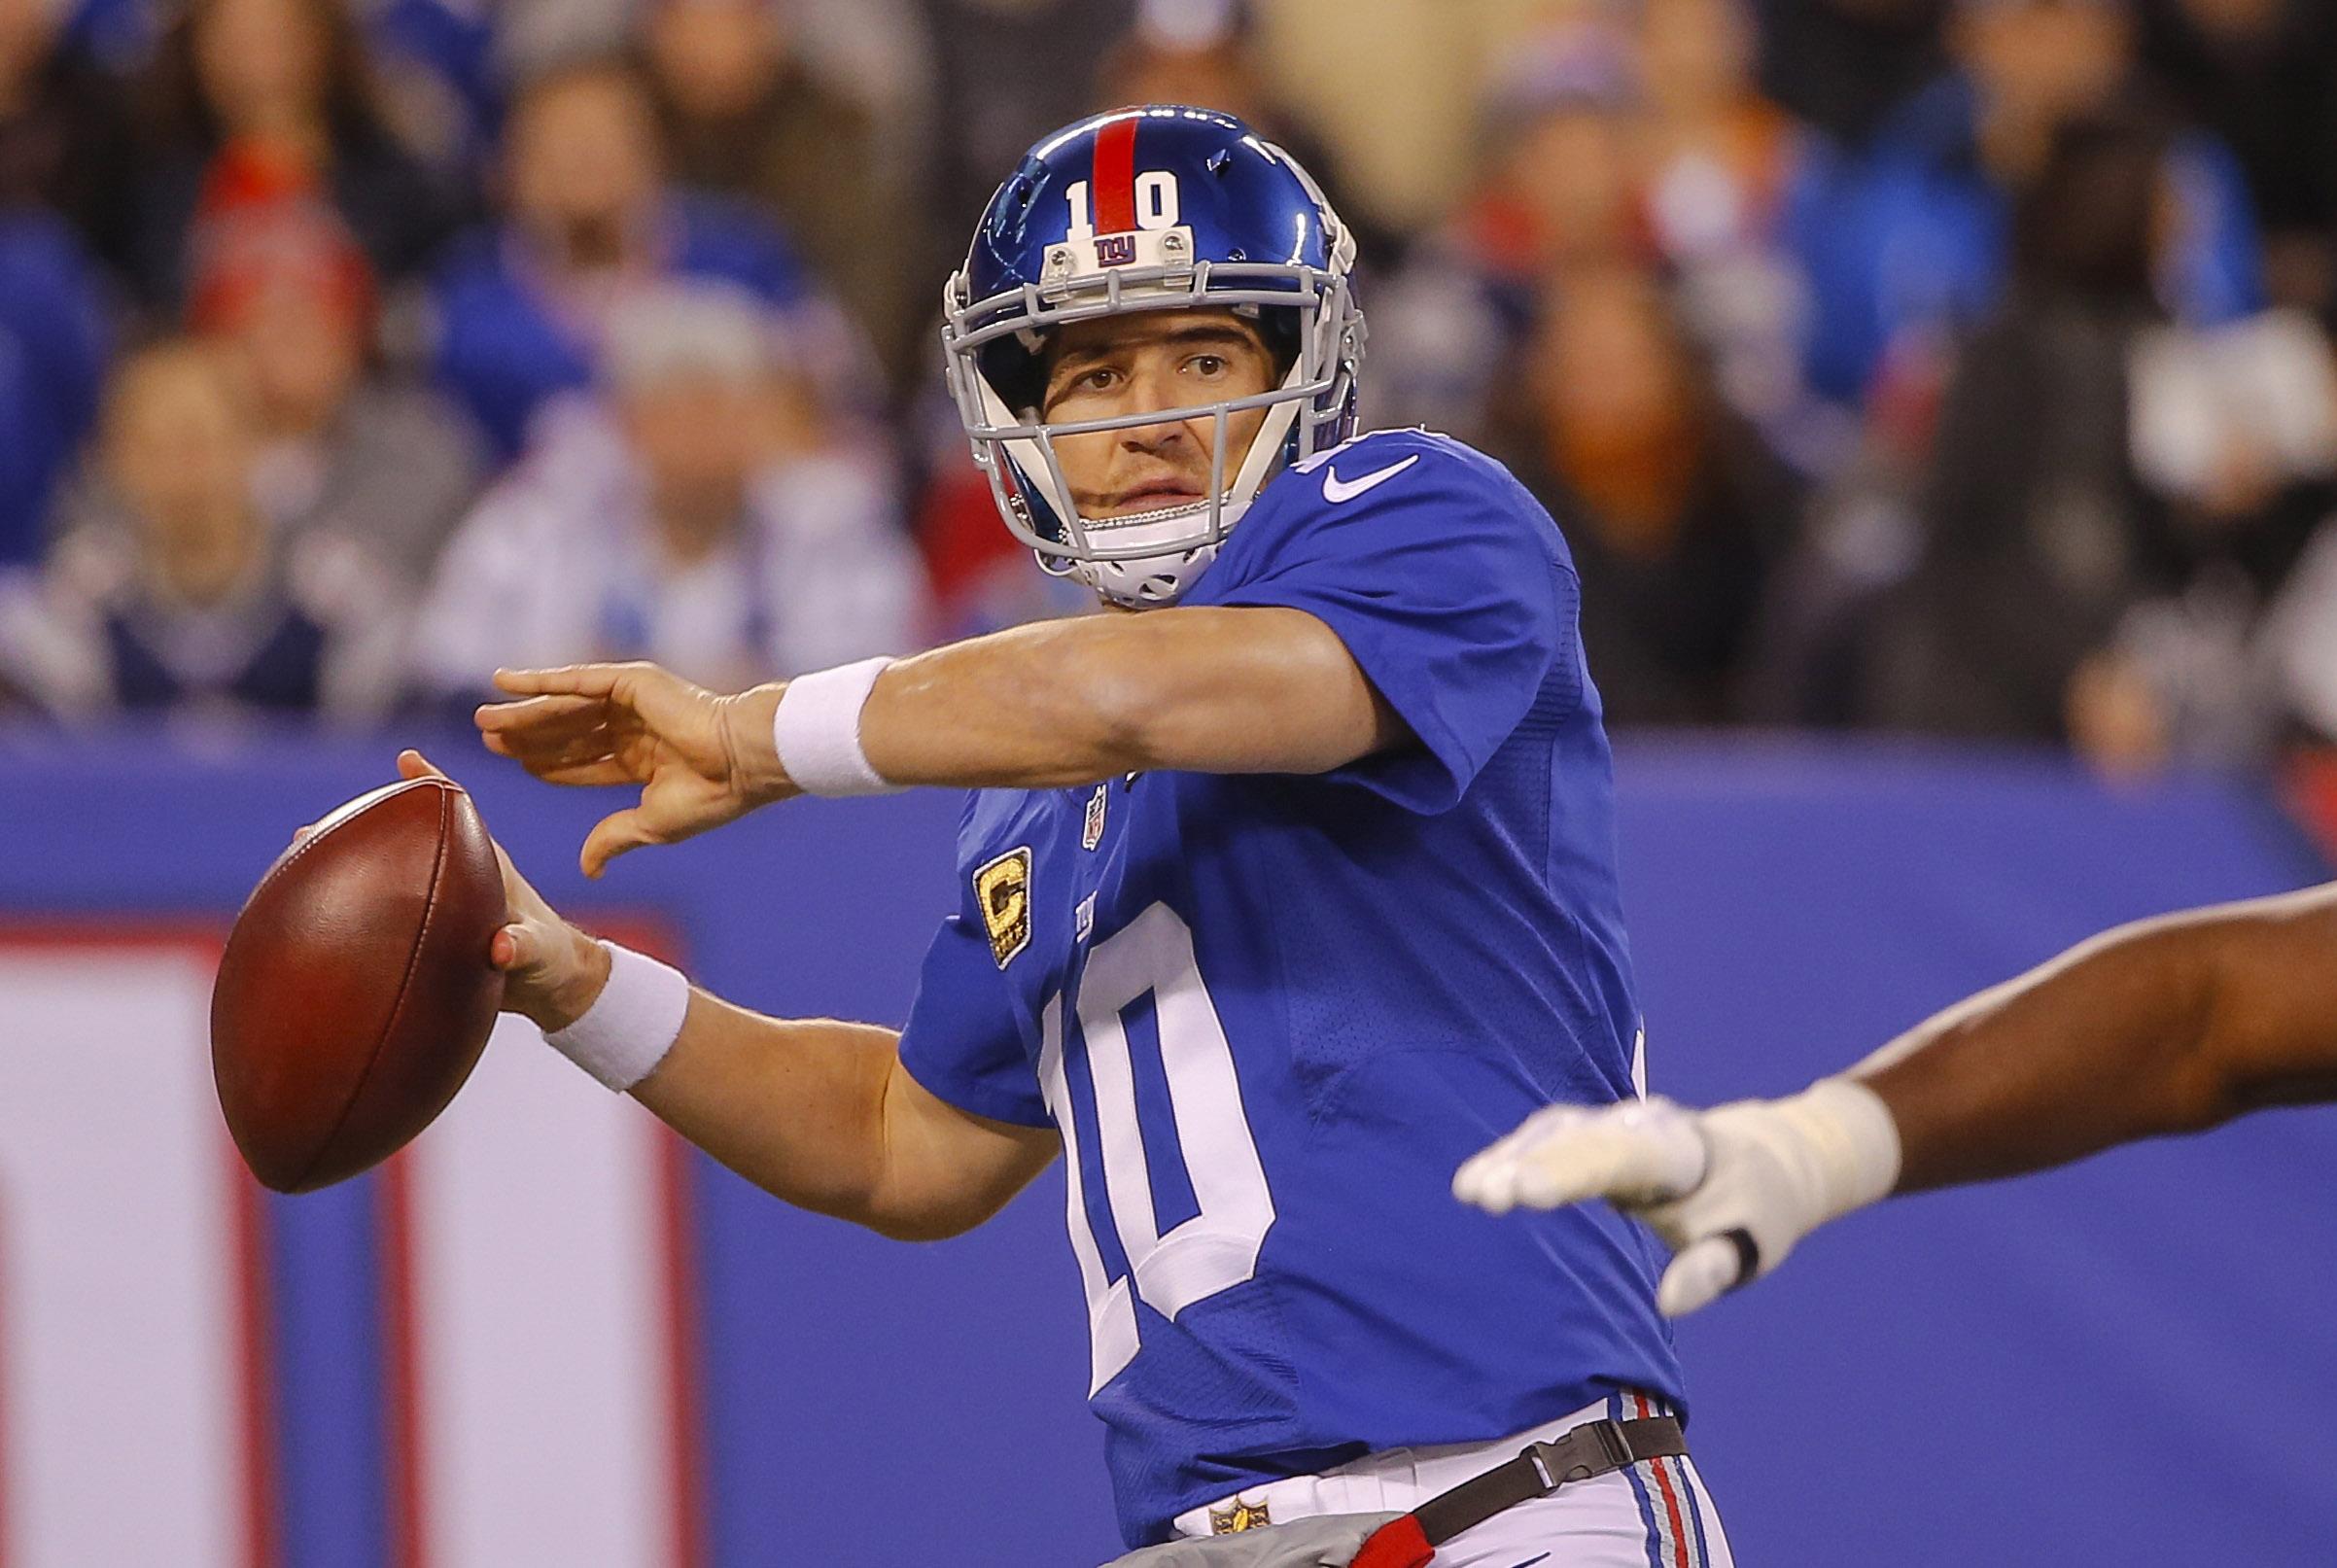 Eli Manning as a New York Jet?